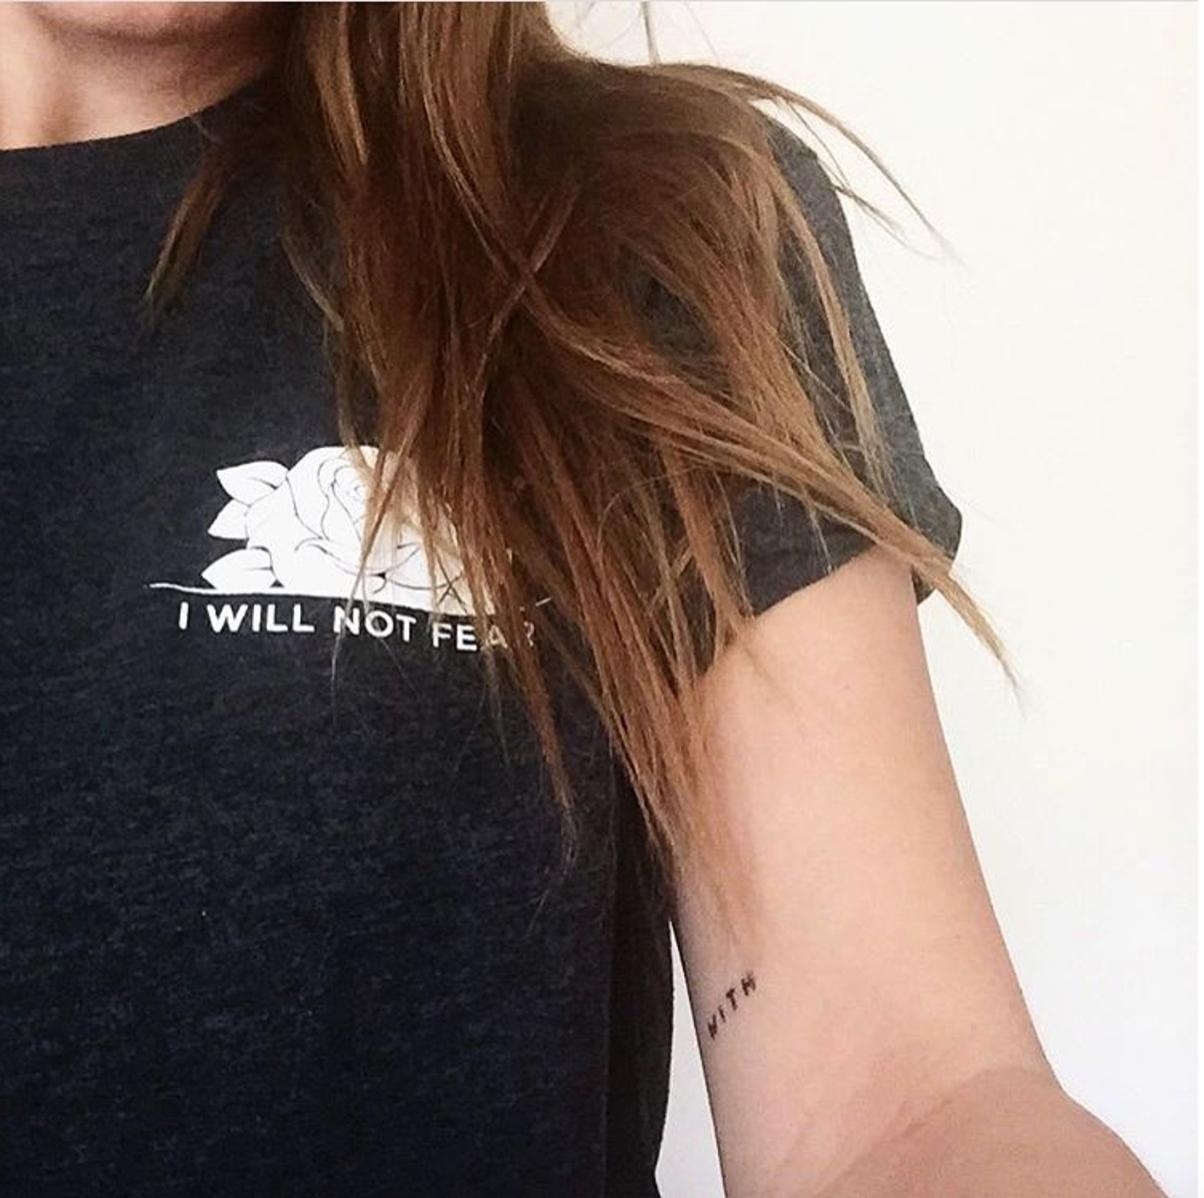 Trending T Shirt Designs